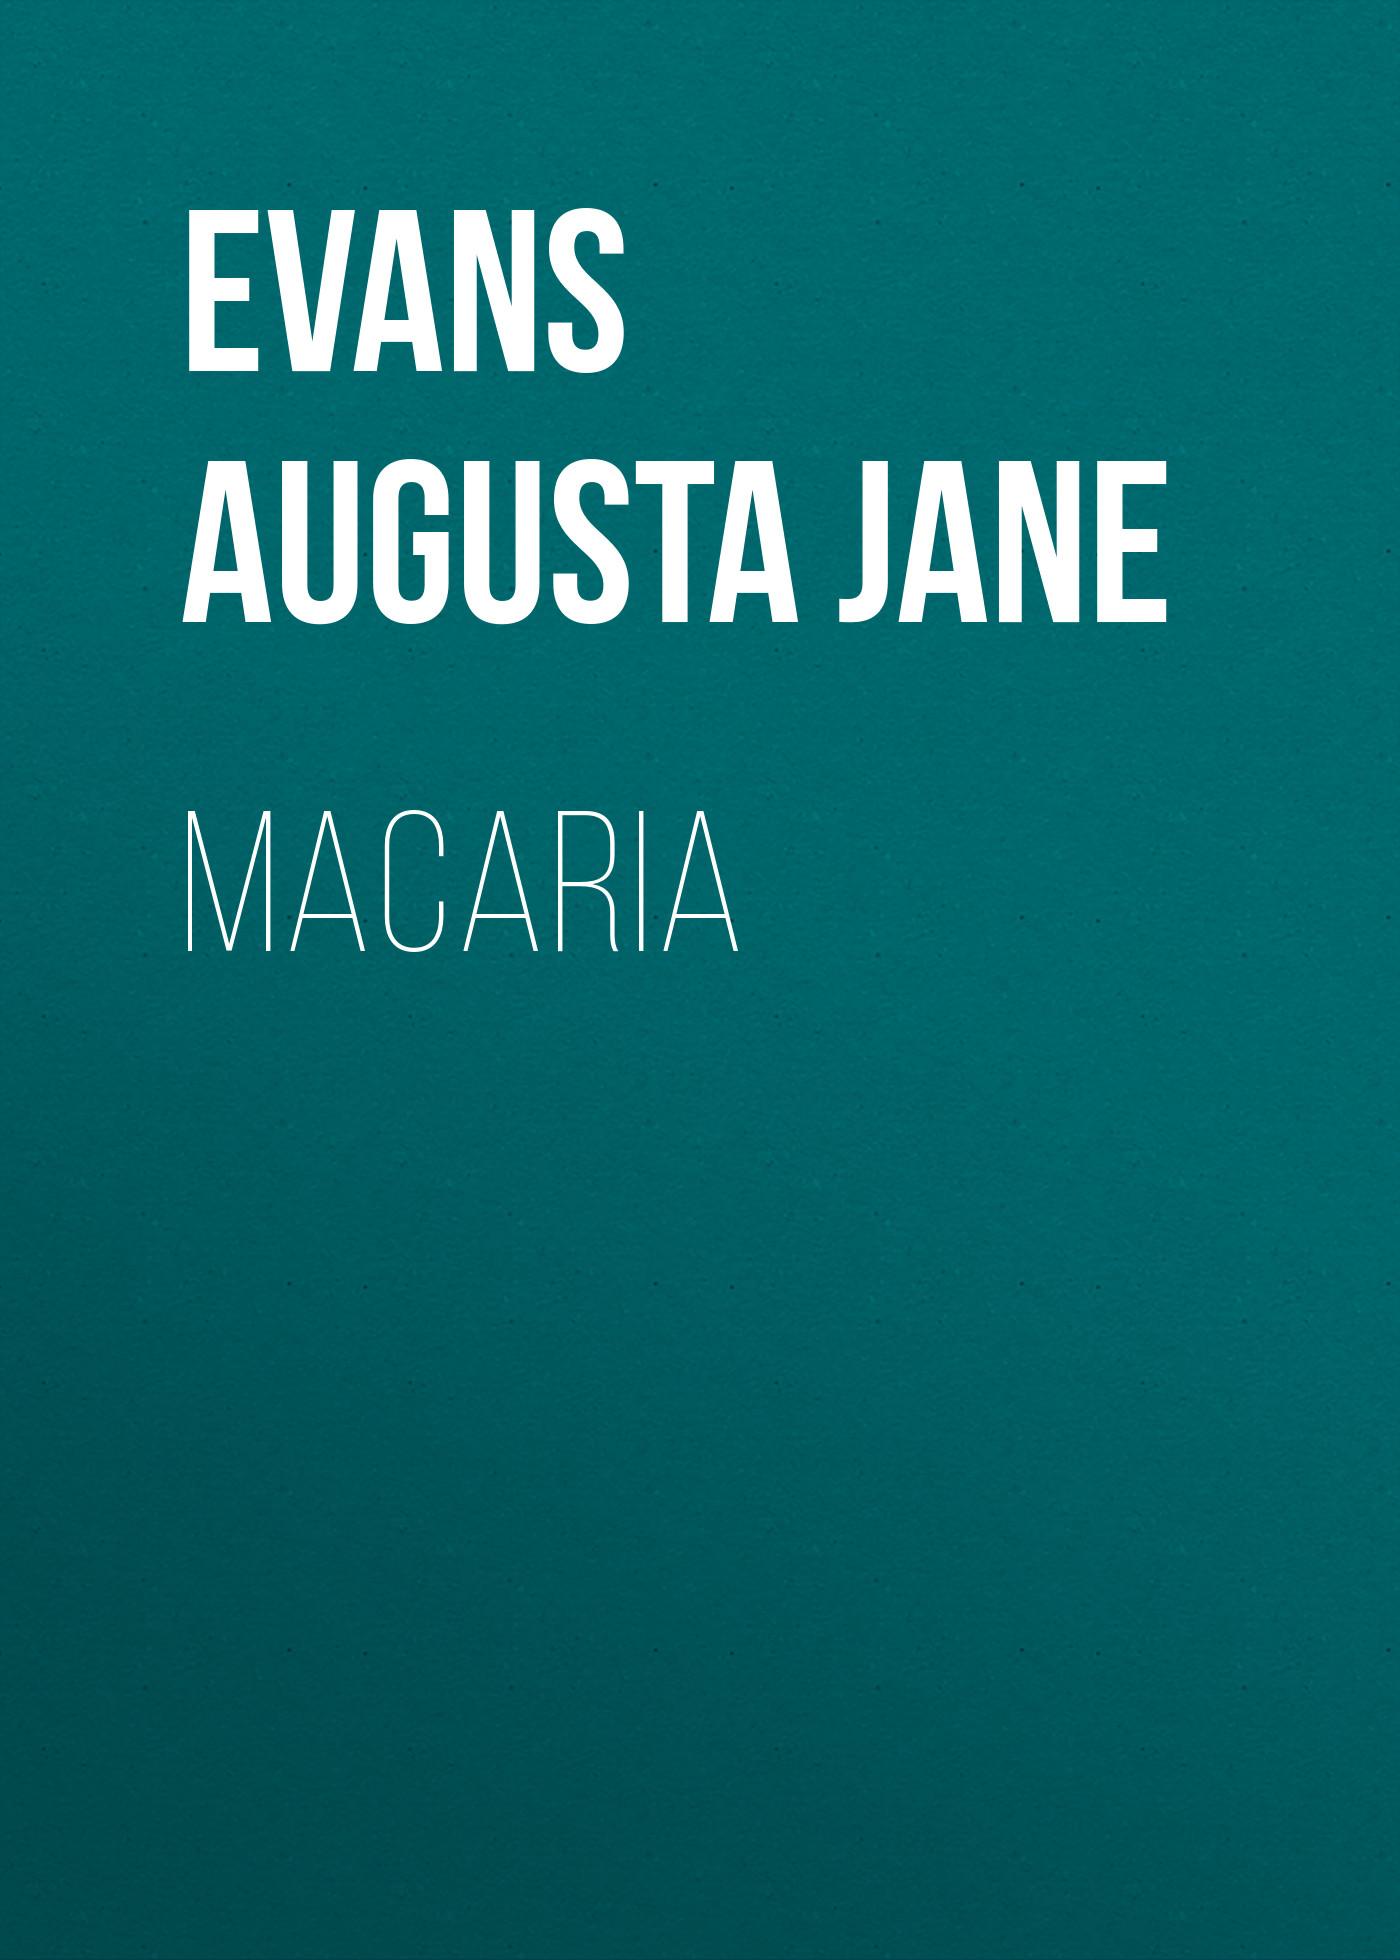 Evans Augusta Jane Macaria